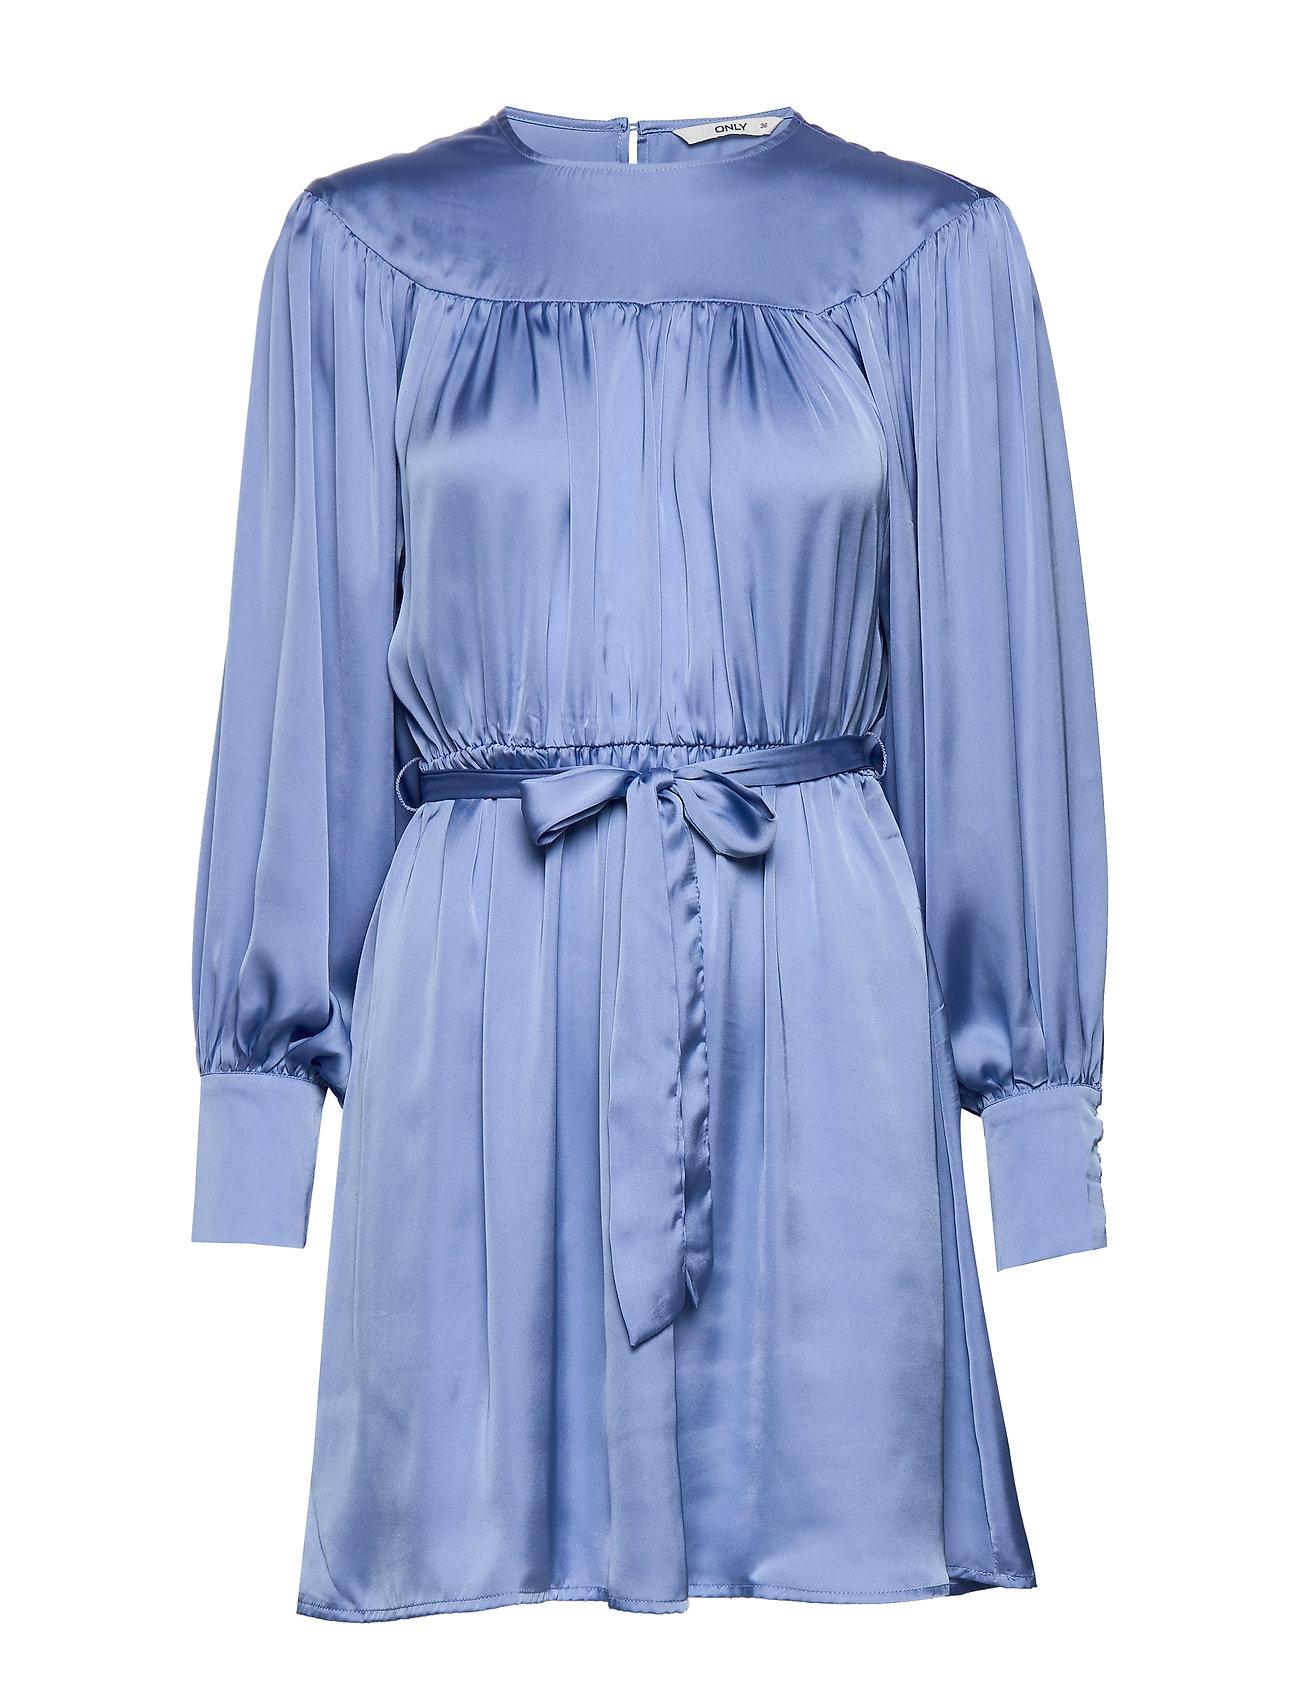 ONLY ONLCASSY L/S SHORT DRESS WVN - BEL AIR BLUE